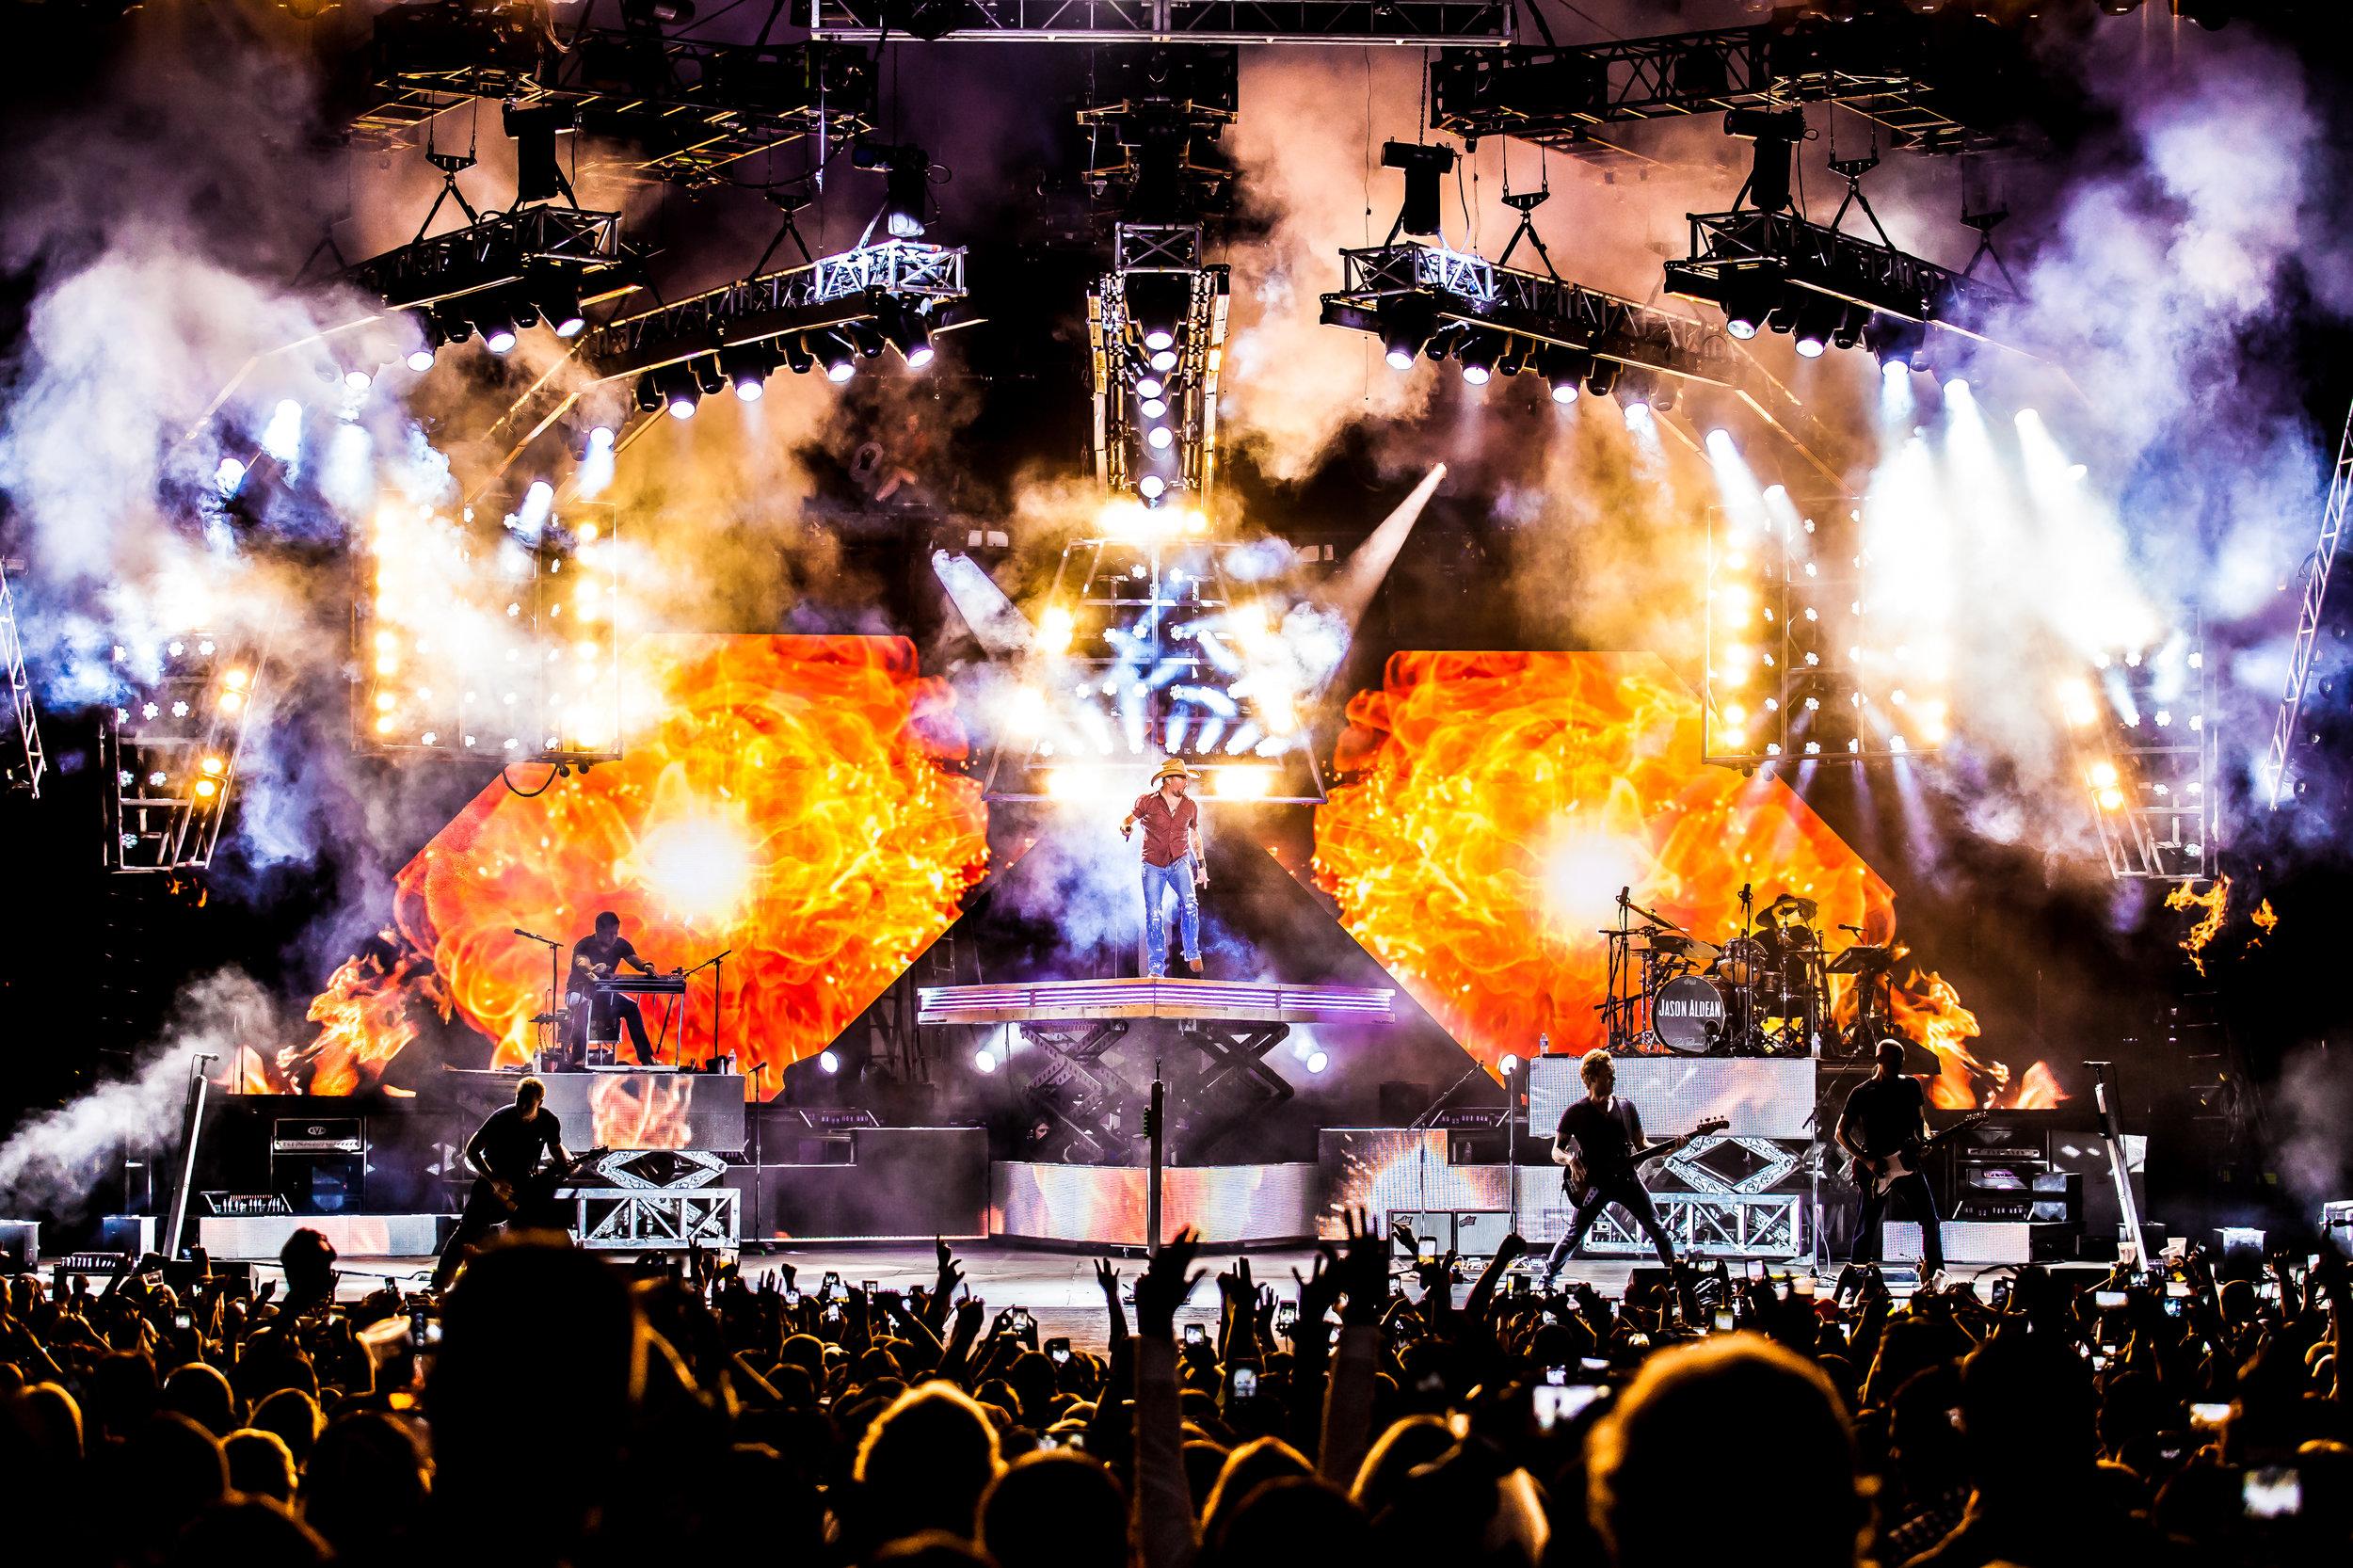 Jason Aldean [Burn It Down Tour 2015]